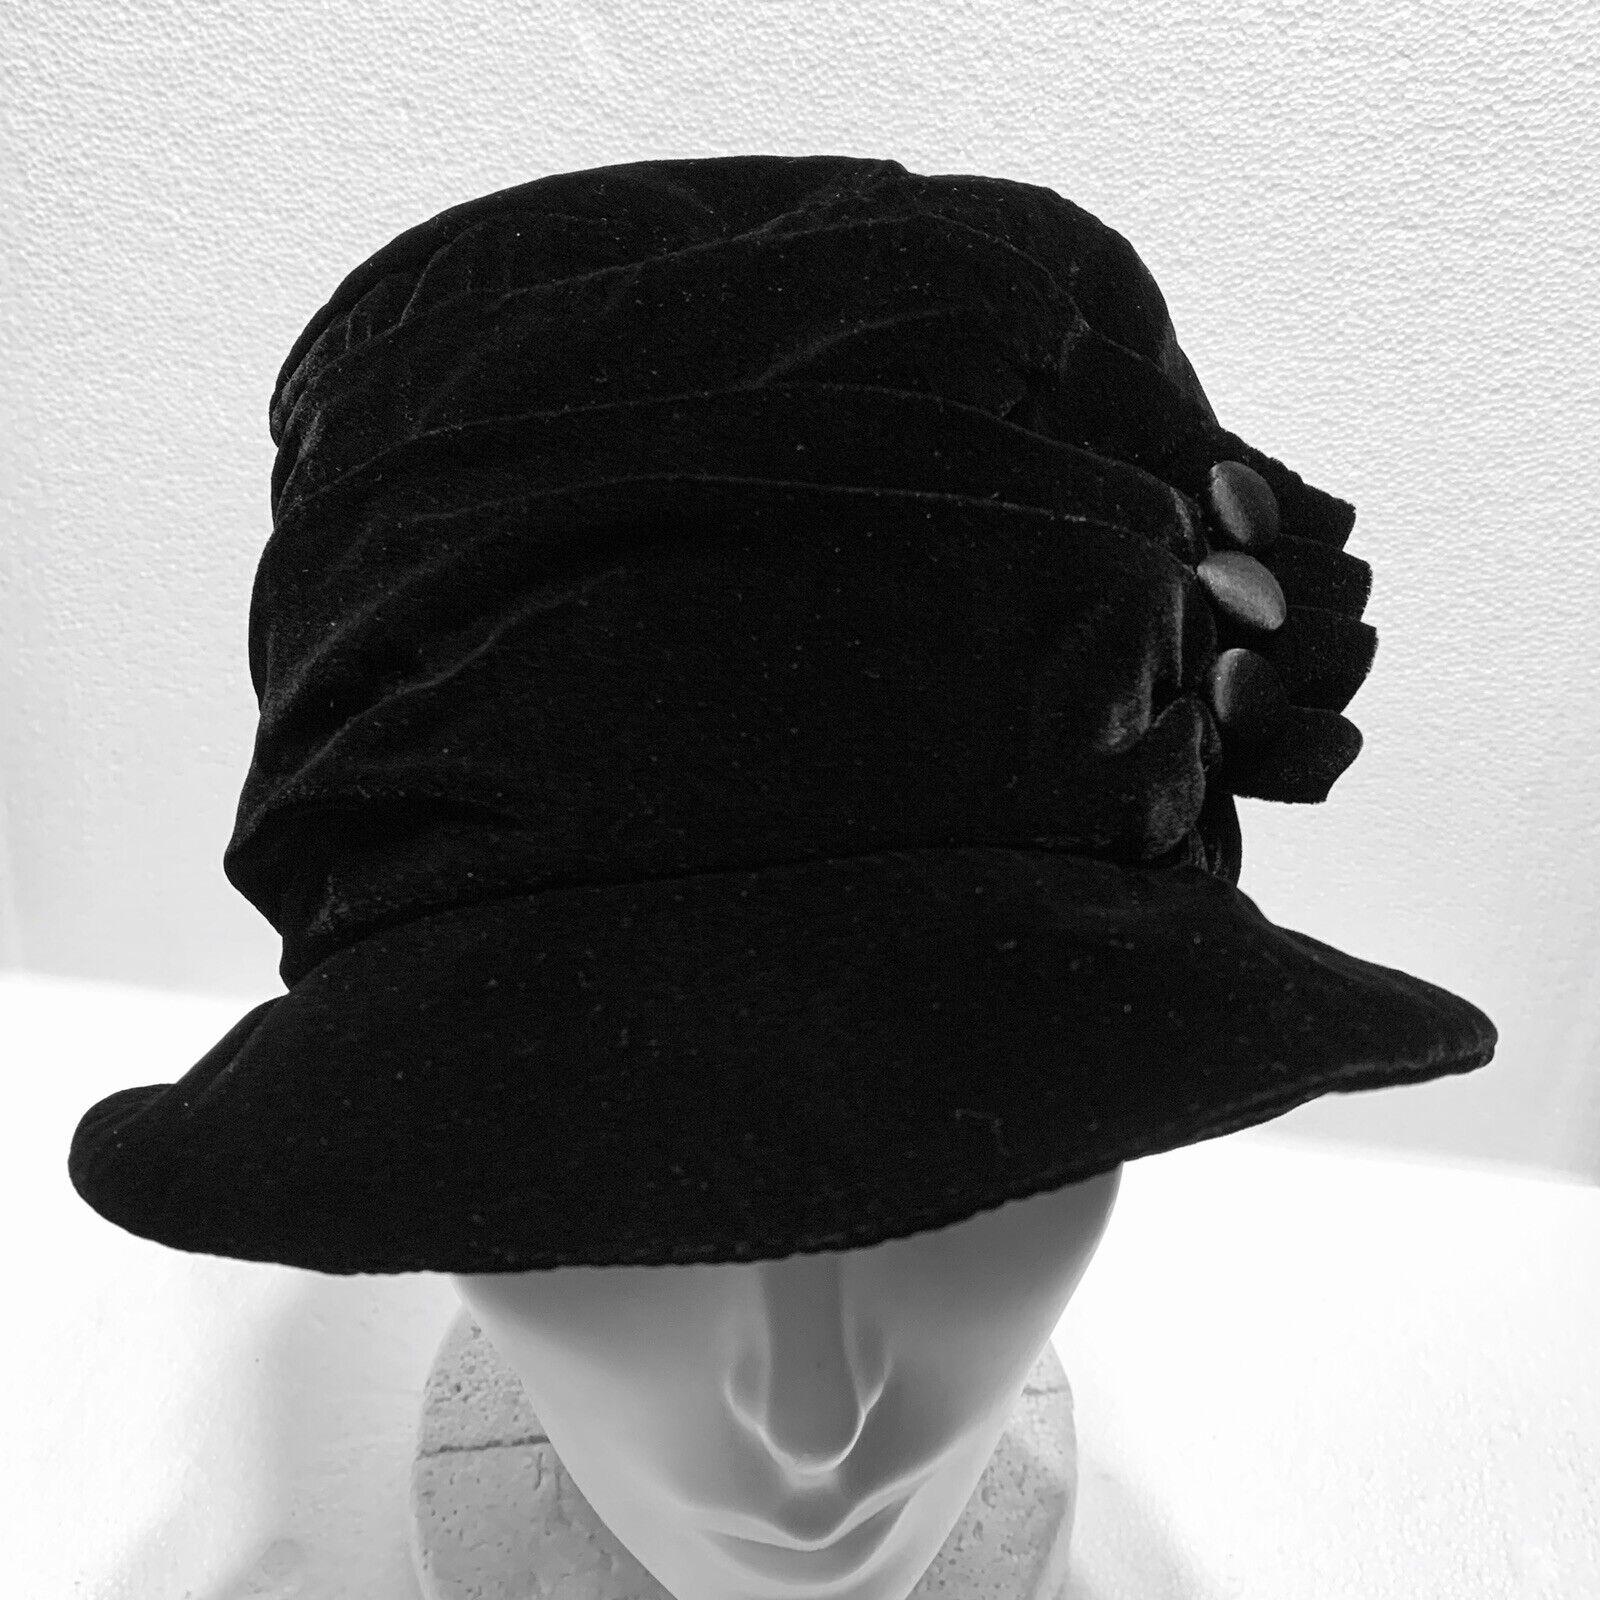 Vintage Liz Claiborne Black Bucket Hat Velvet Look Satin Buttons